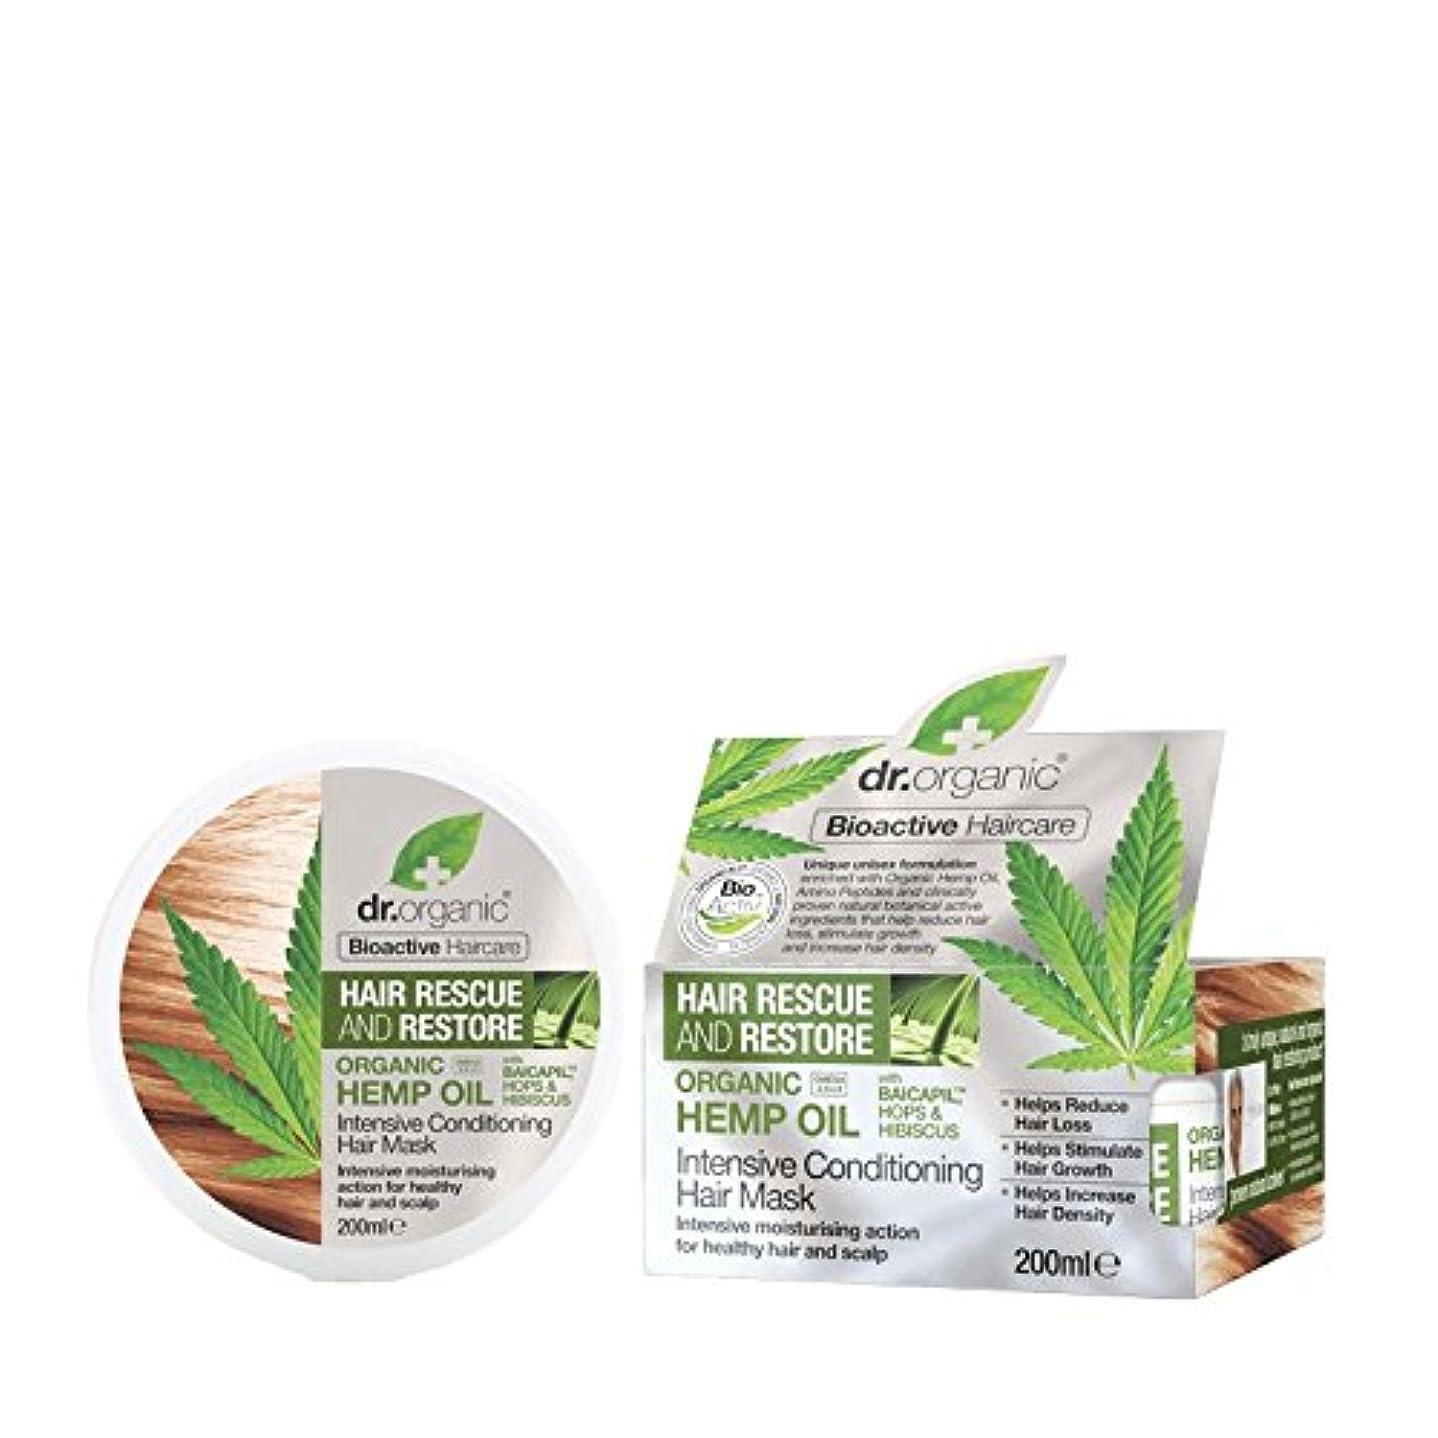 Dr Organic Hemp Oil Intensive Conditioner 200ml (Pack of 2) - Dr有機大麻油の集中コンディショナー200ミリリットル (x2) [並行輸入品]